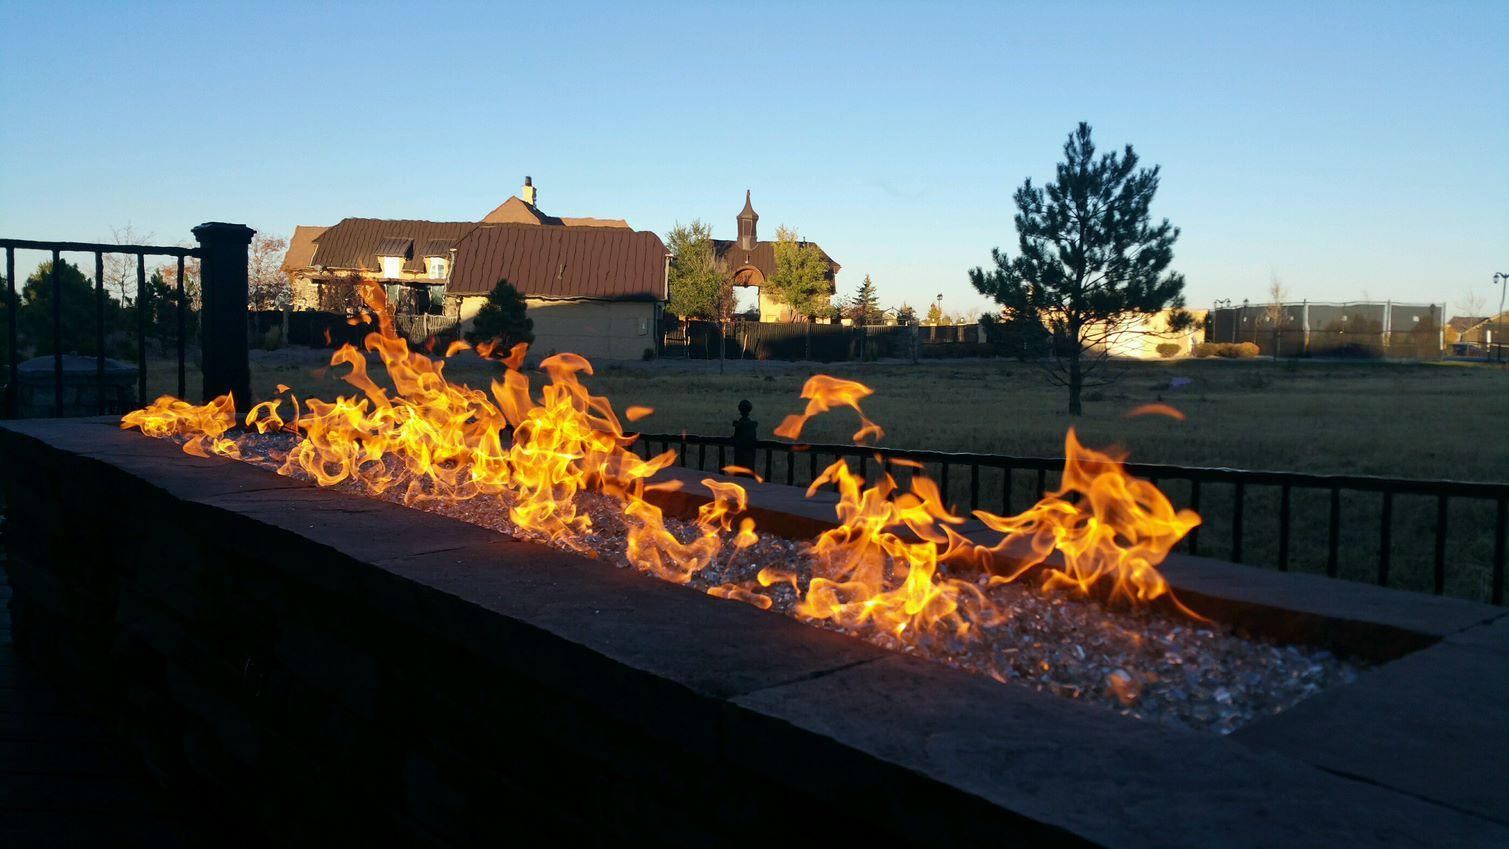 Custom Decks Fire Pit 1 Million Btus